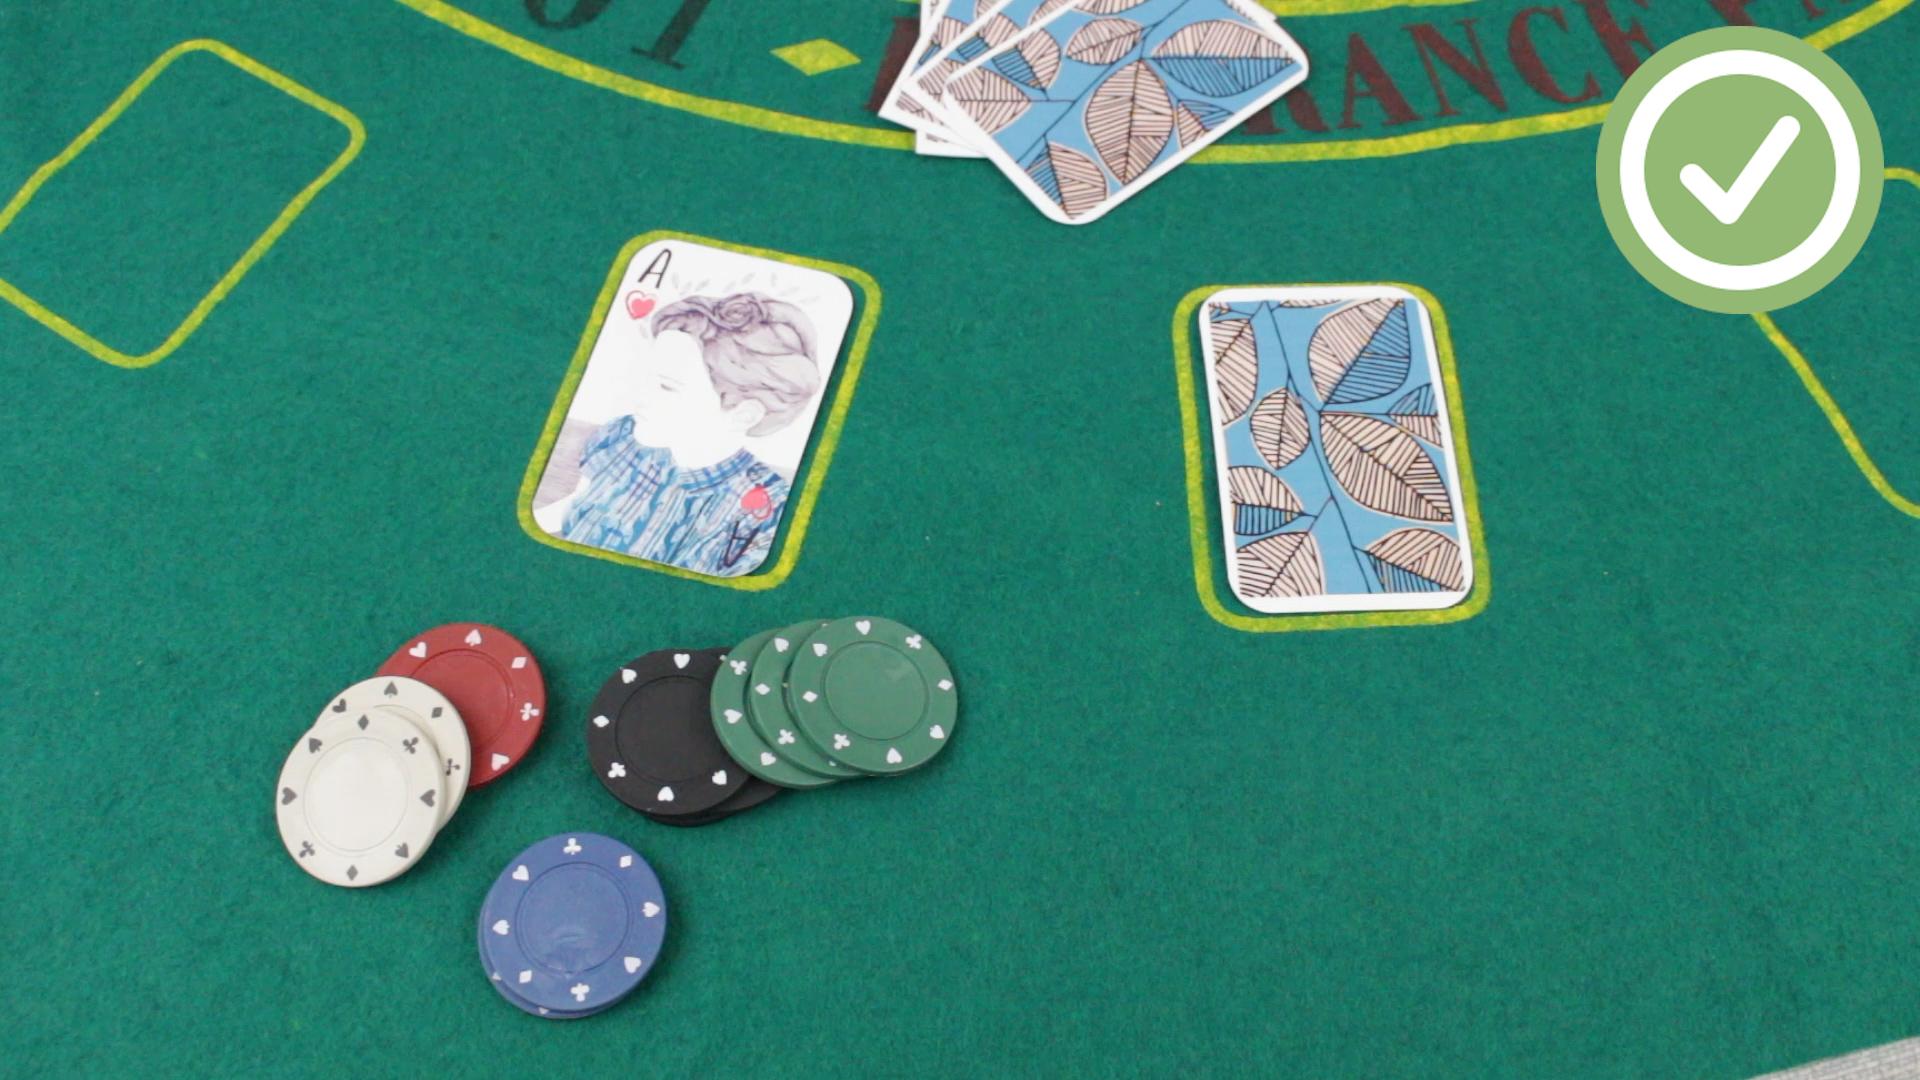 Image Titled Make Playing Cards Step Poker 1920x1080 Wallpaper Teahub Io